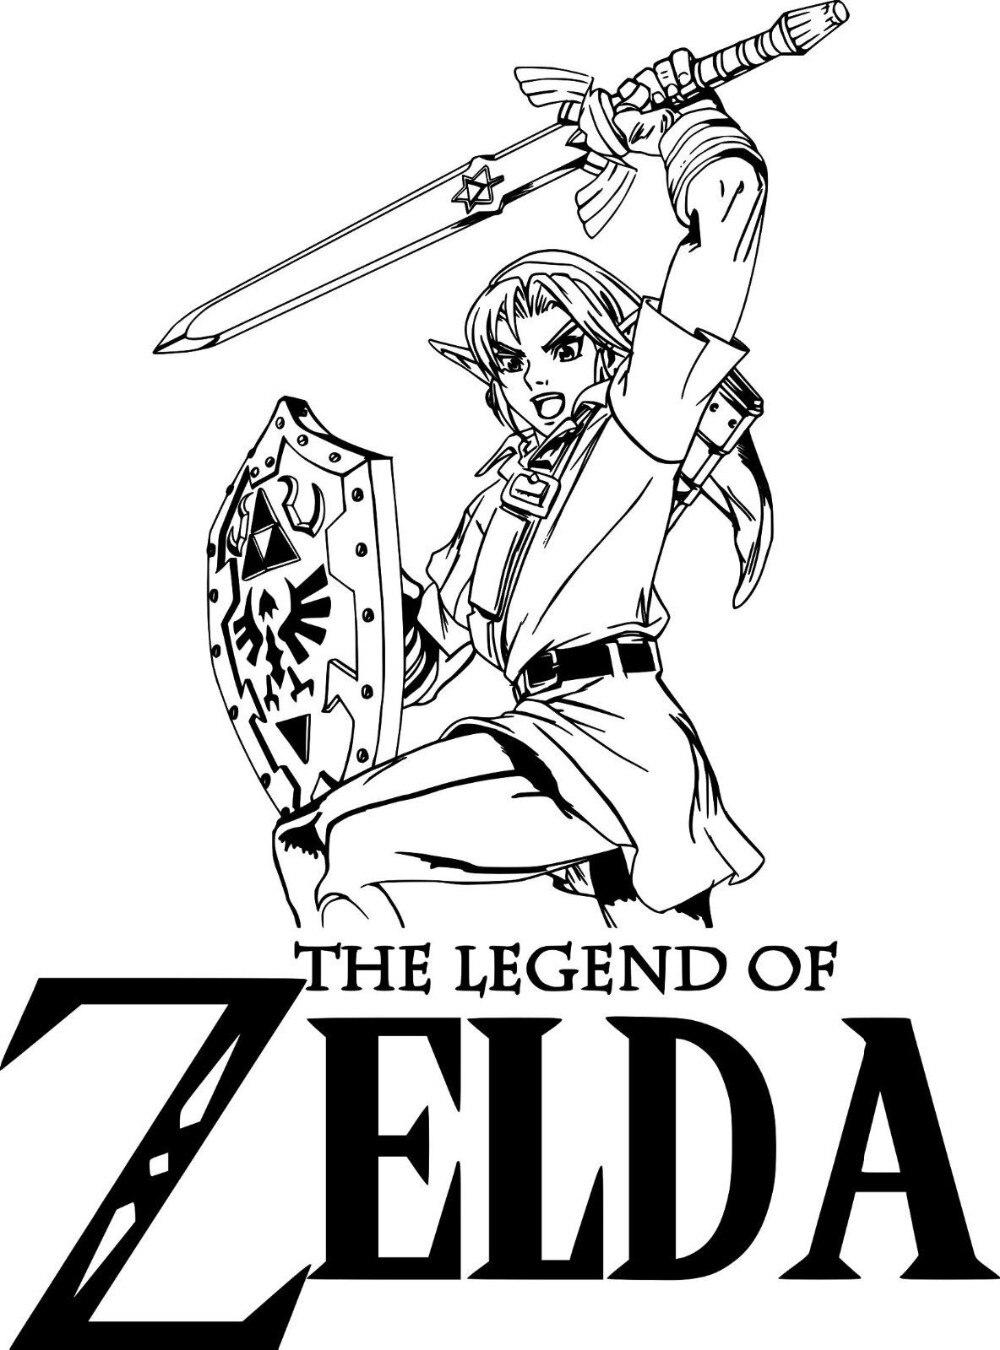 Manga Legend Of Zelda Quot Link Quot Gaming Diy Wall Art Sticker